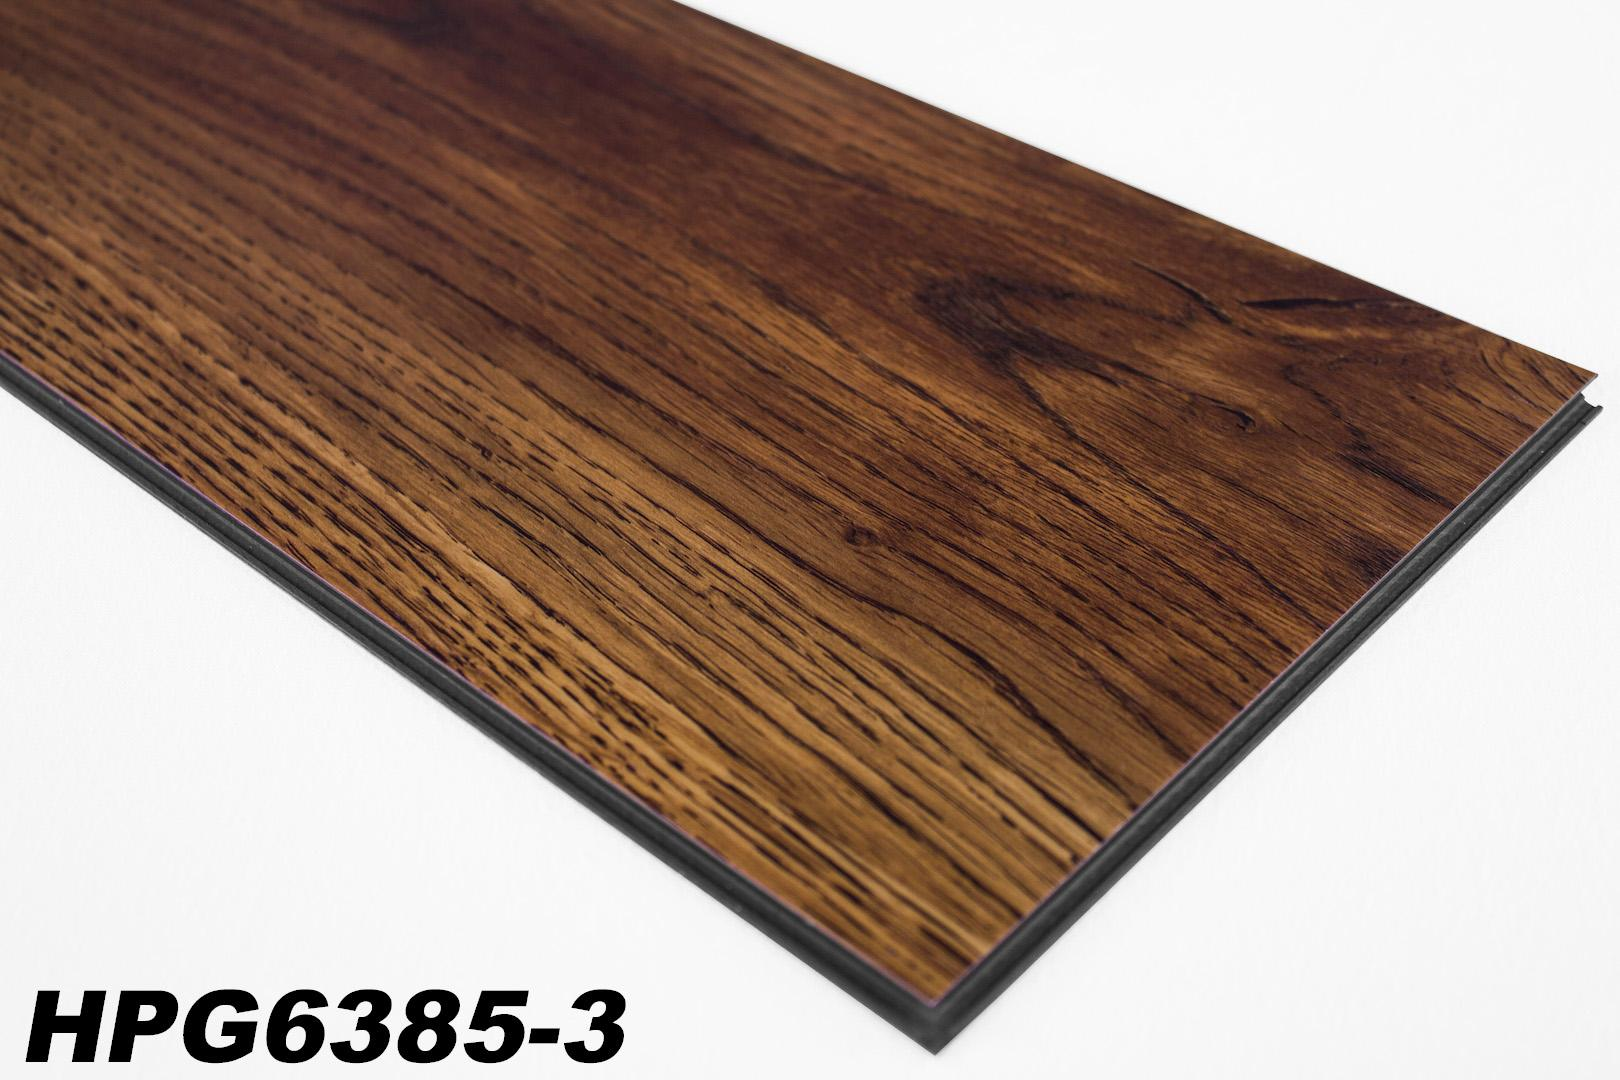 10m vinylboden in 4 2mm uniclic dielen klick vinyl. Black Bedroom Furniture Sets. Home Design Ideas